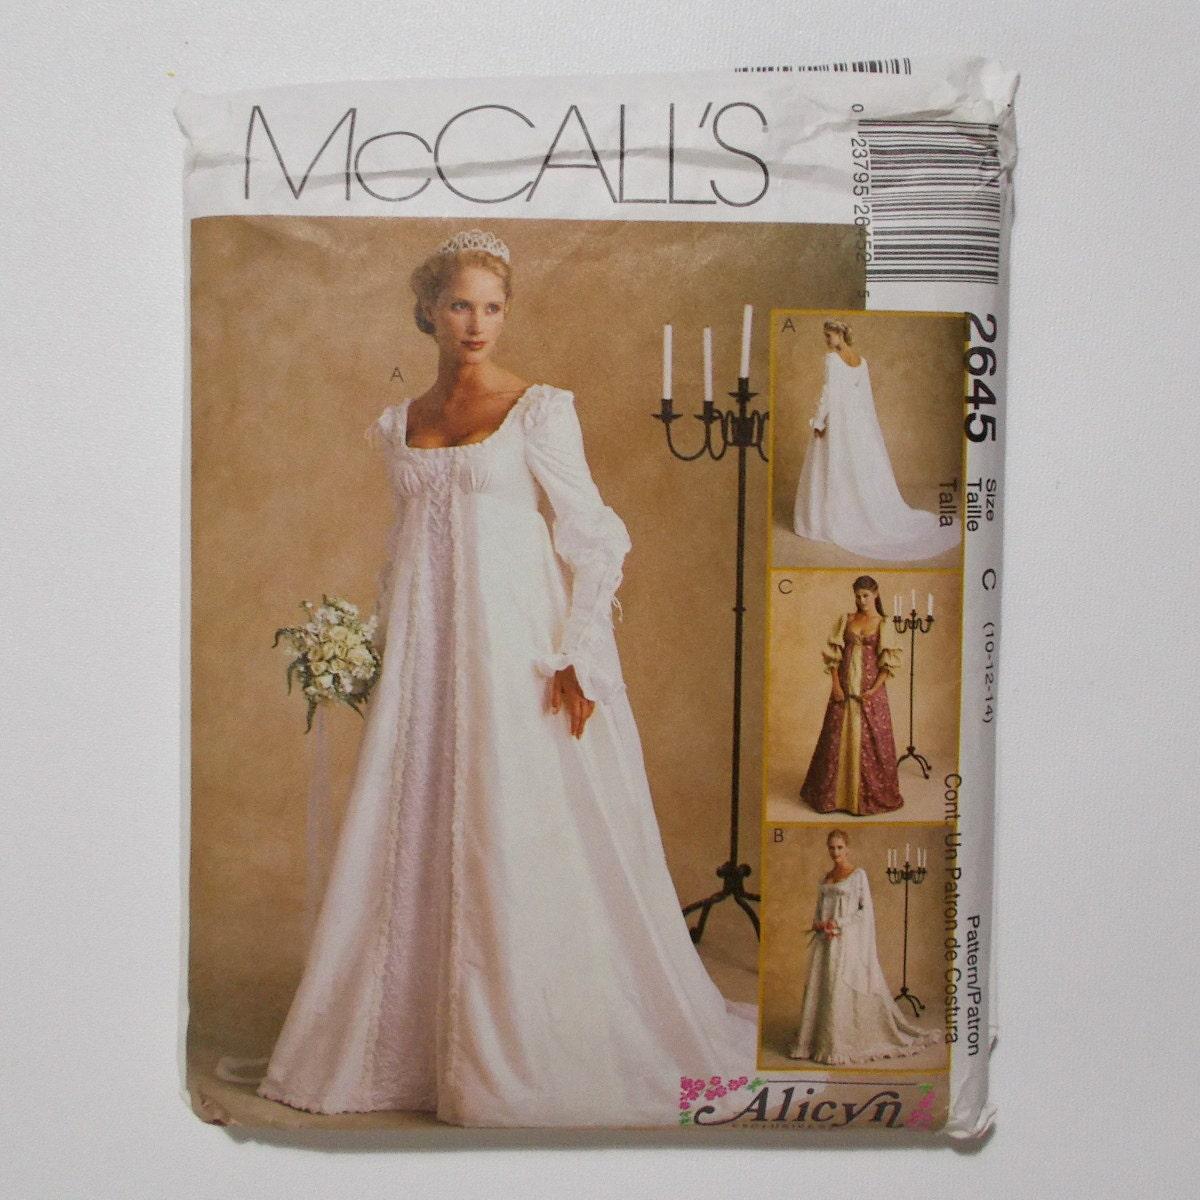 Renaissance Faire Wedding Dress Gown Costume History Mccalls: McCalls 2645 Renaissance Bridal Gown Pattern Ren Faire Wedding